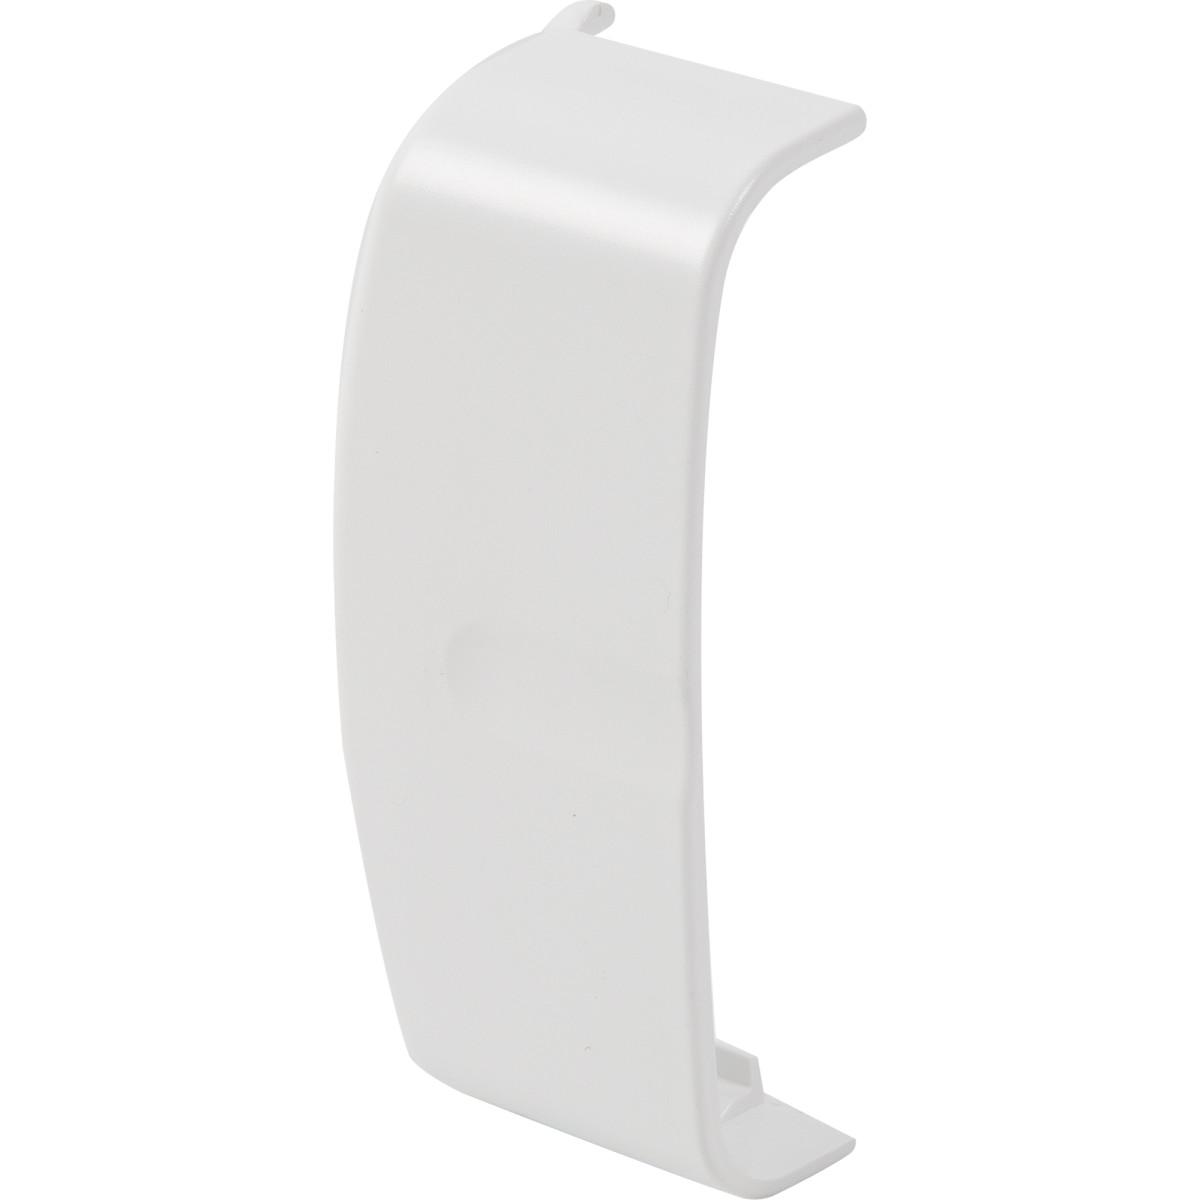 Заглушка 80x20 мм цвет белый